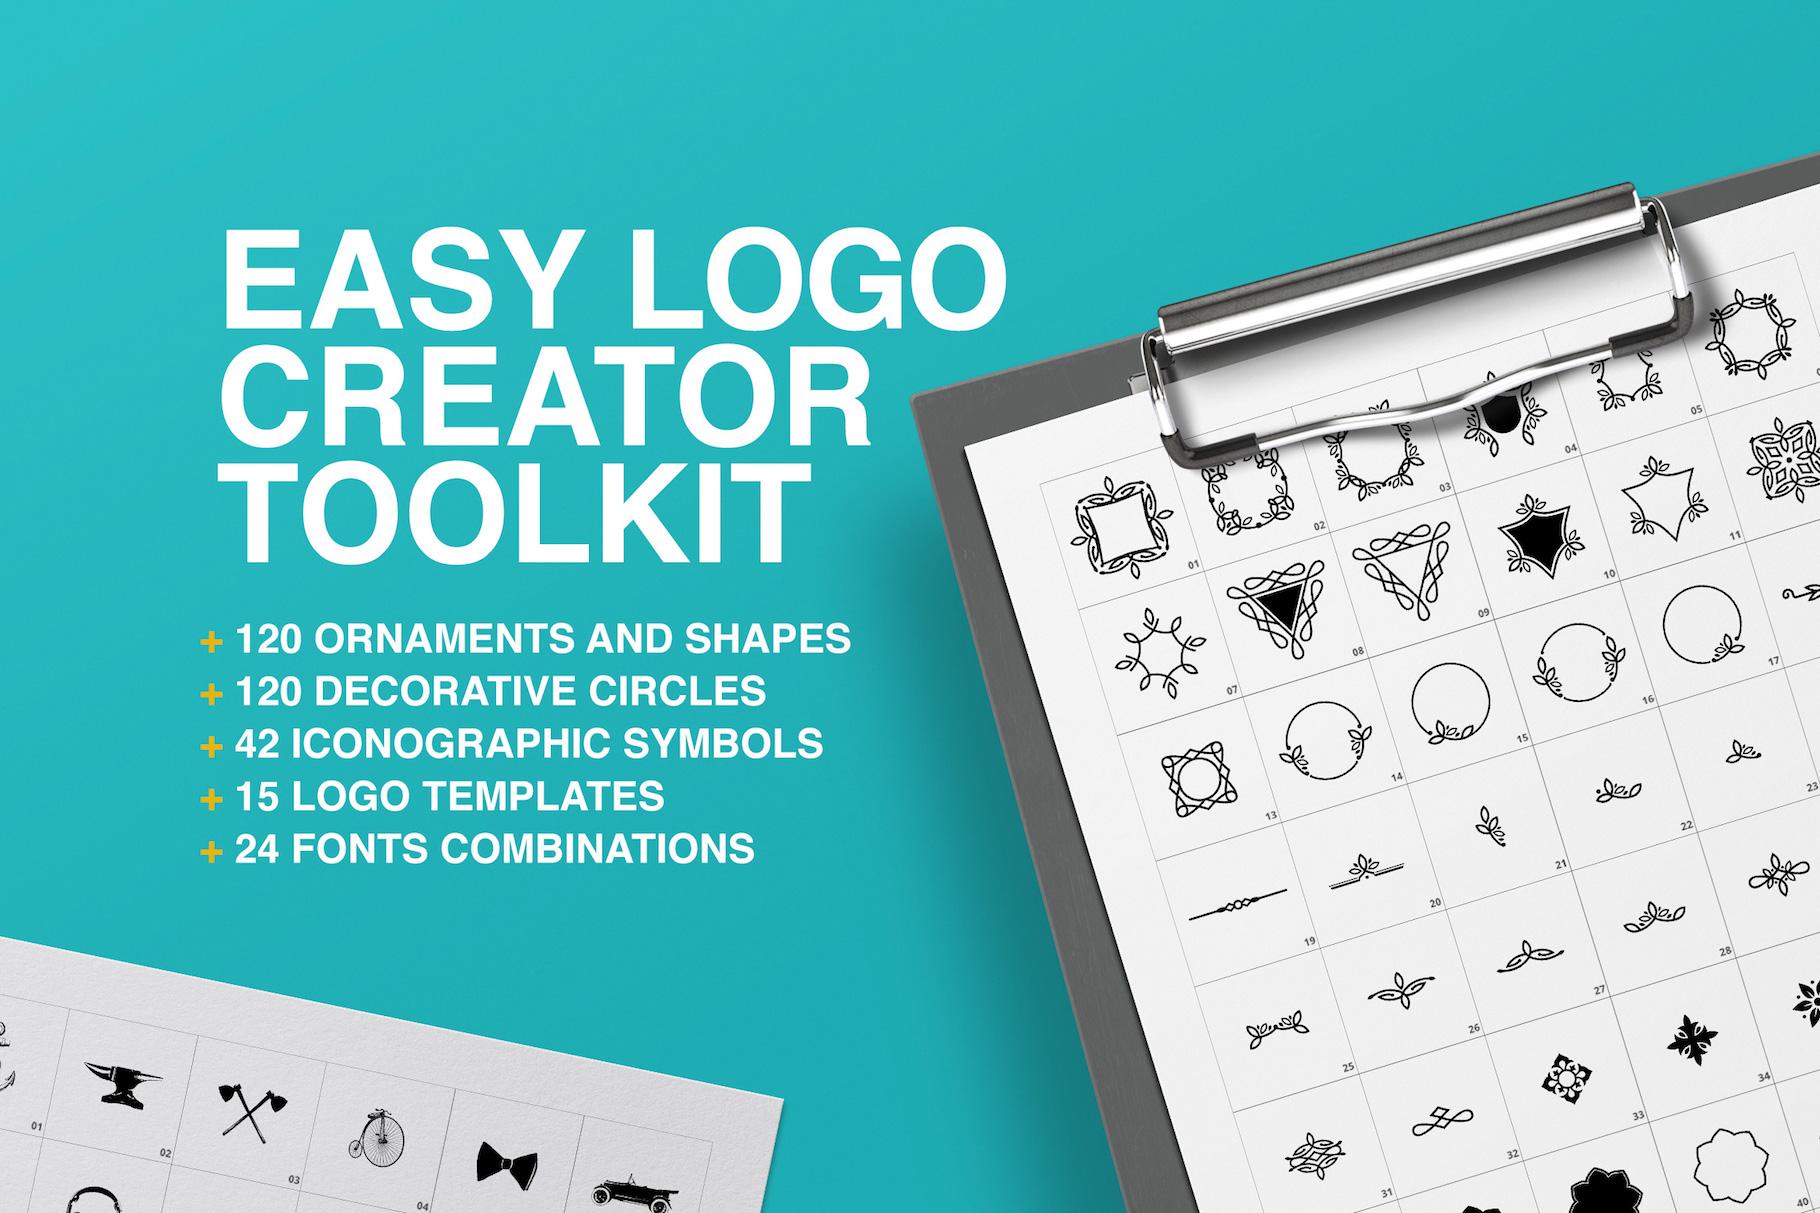 easy-logo-creator-toolkit-easybrandz